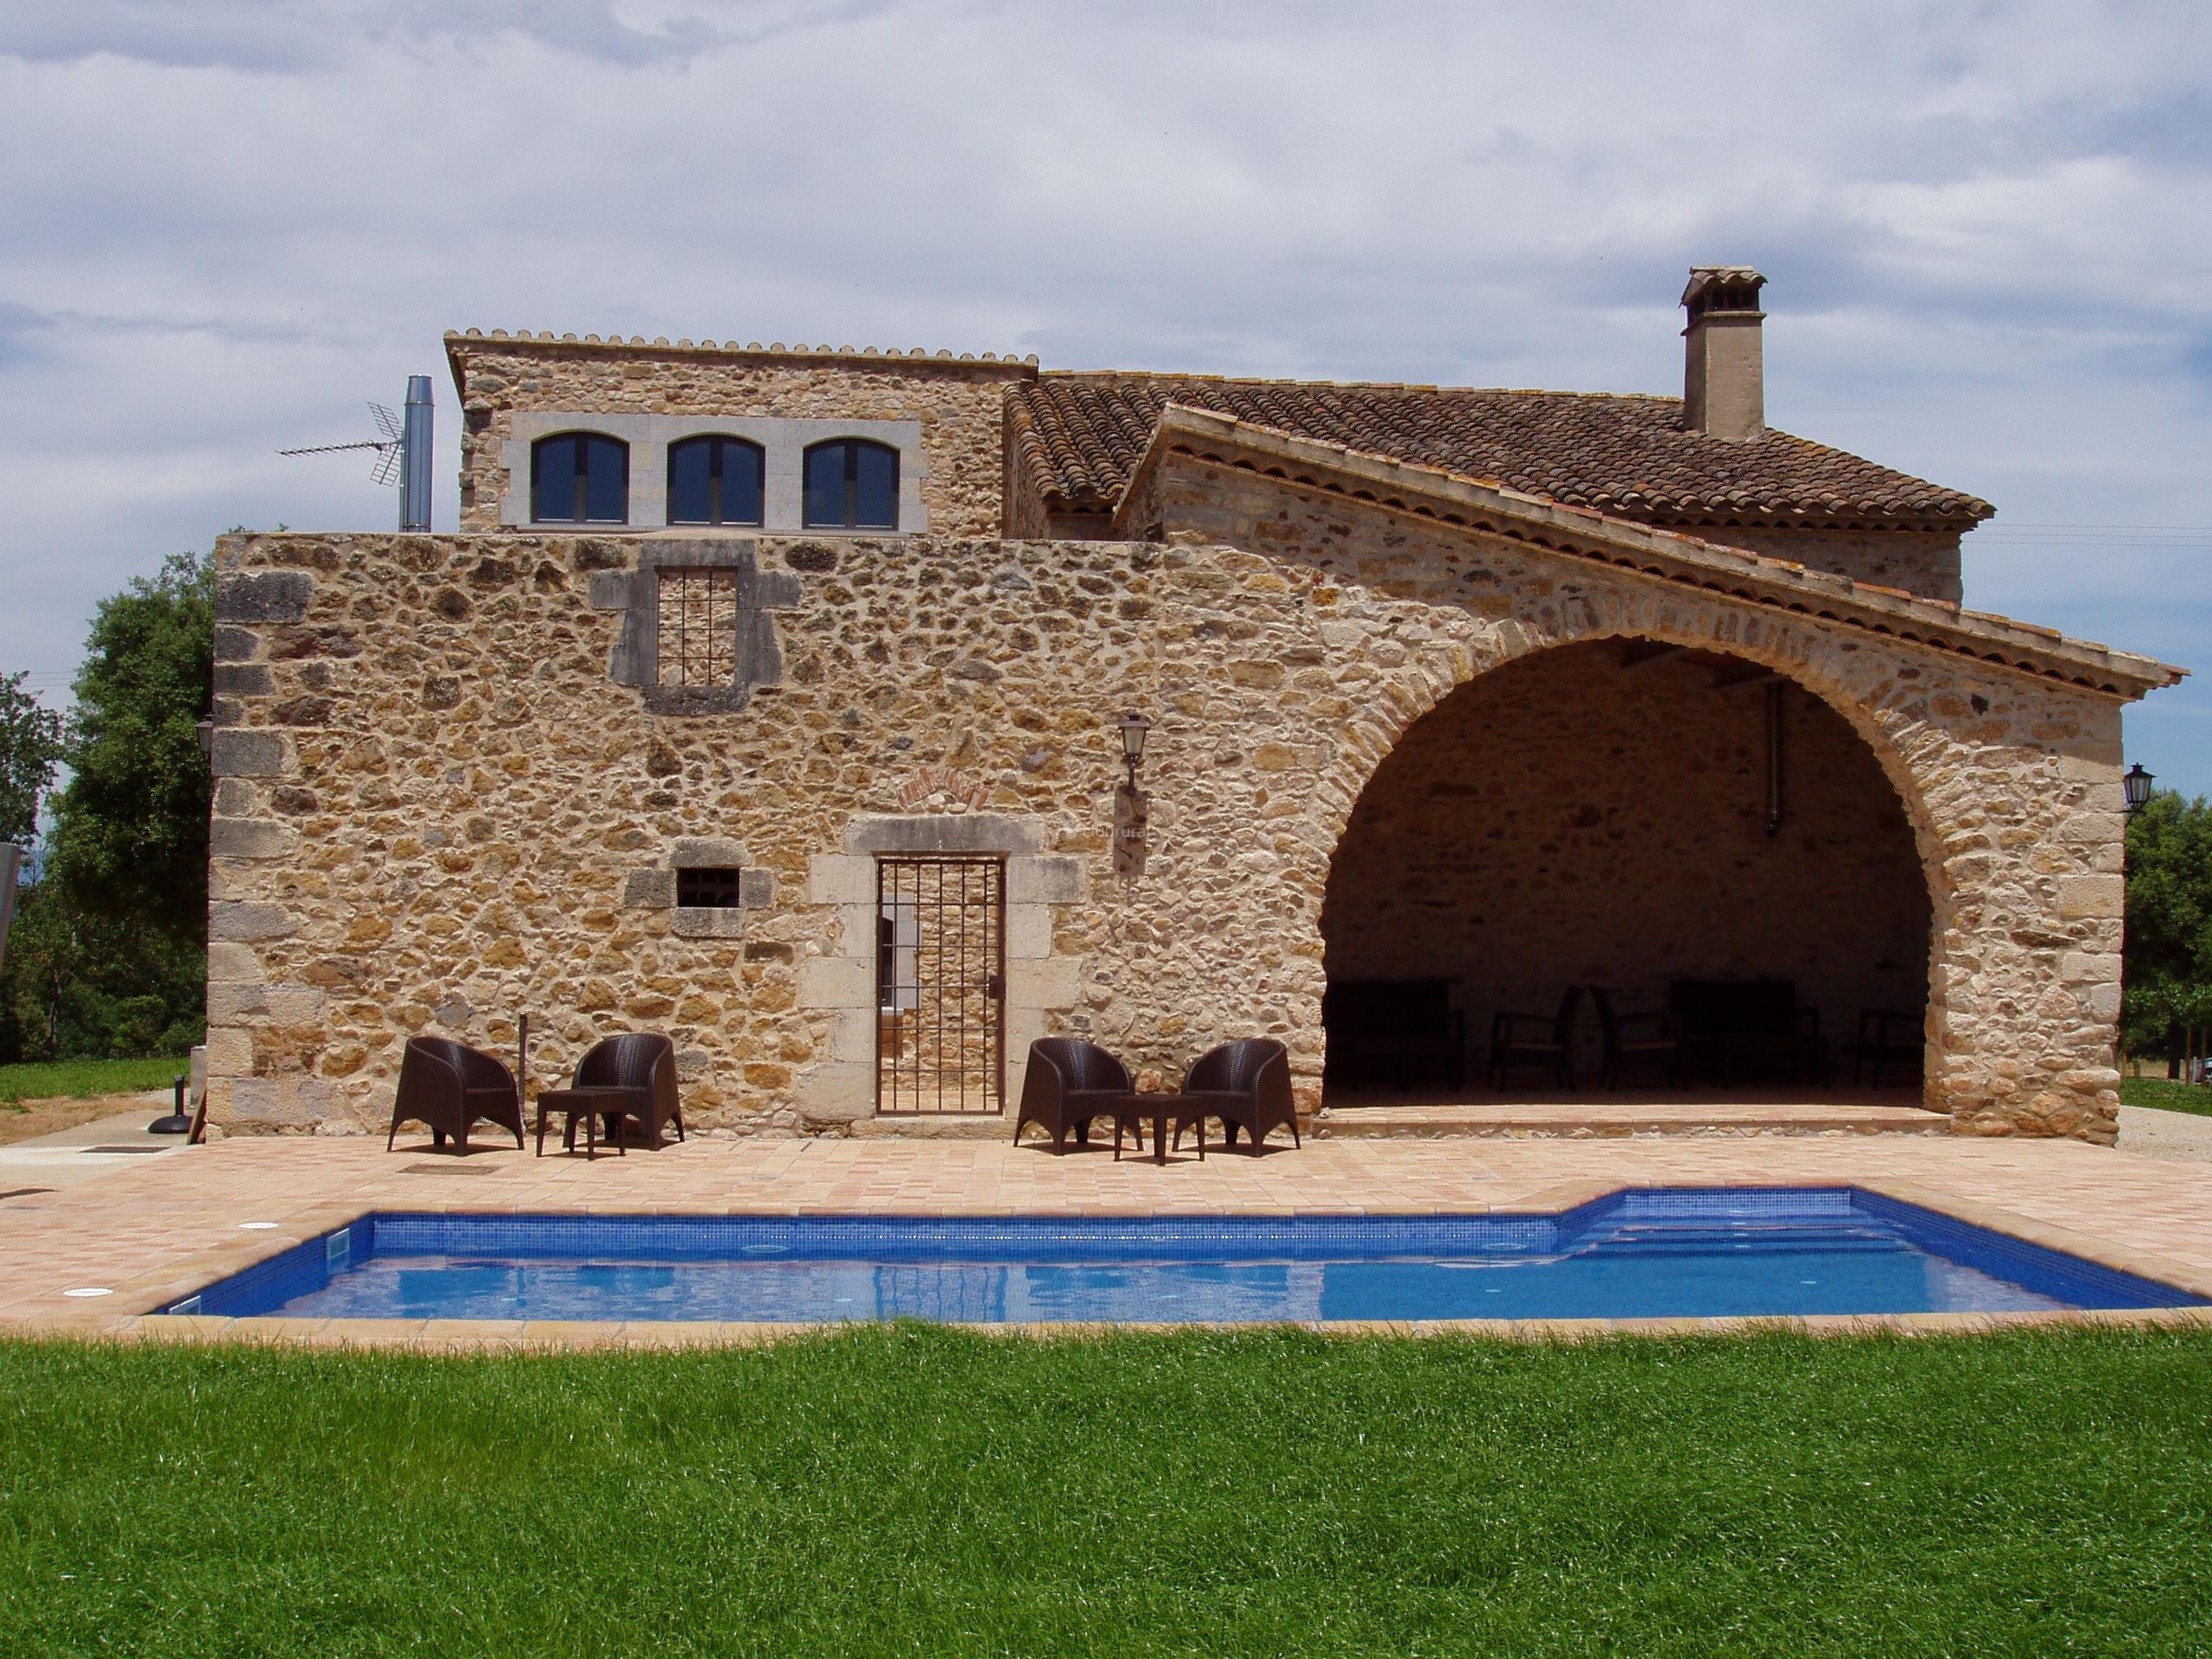 Fotos de mas trobat girona juia clubrural - Mas trobat casa rural ...